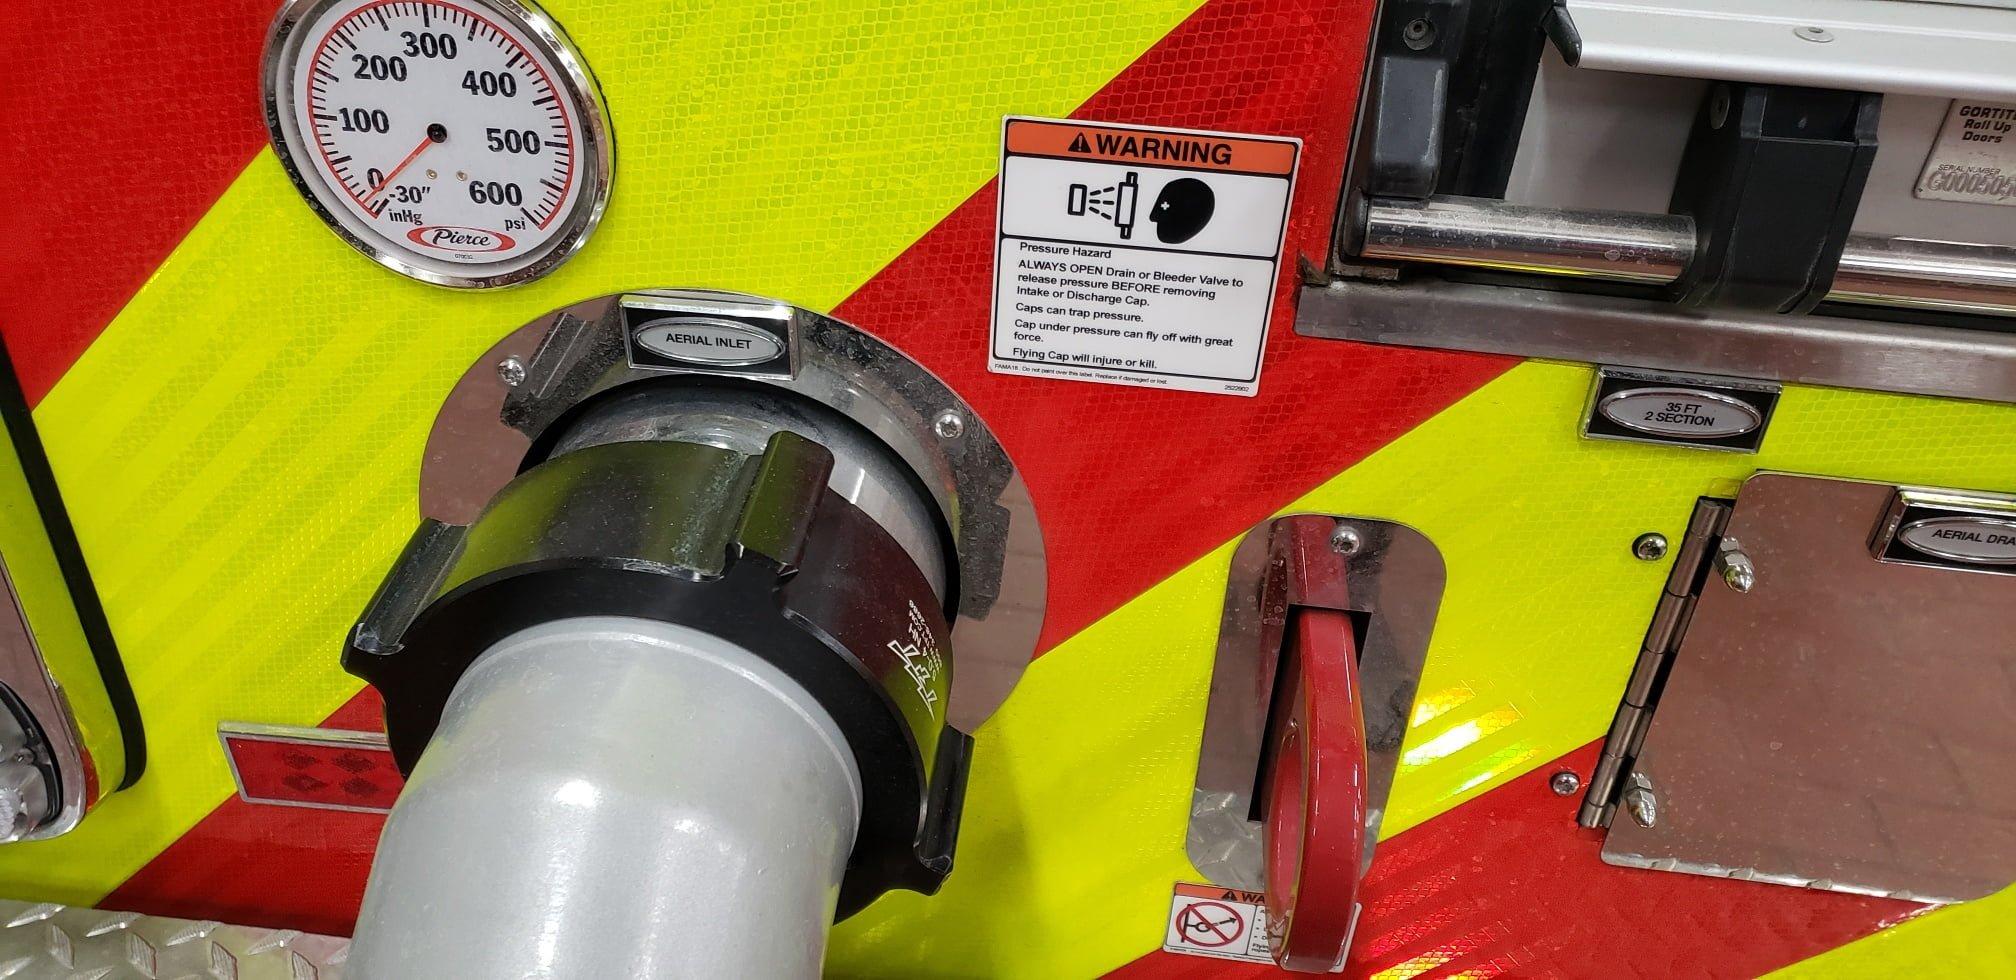 Commonsense signage on fire apparatus